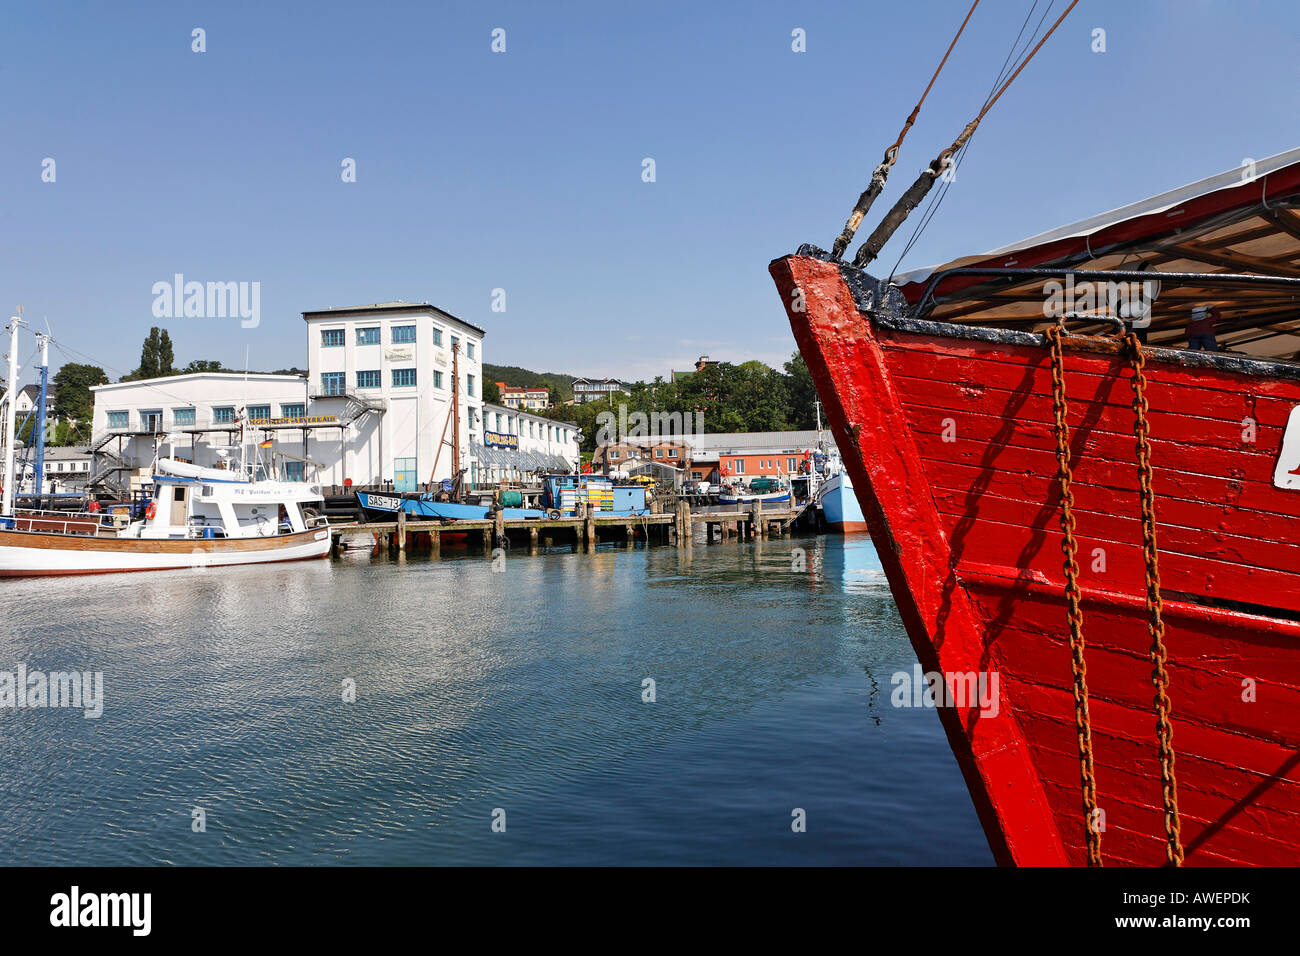 Sassnitz Harbour, Ruegen, Germany, Europe Stock Photo